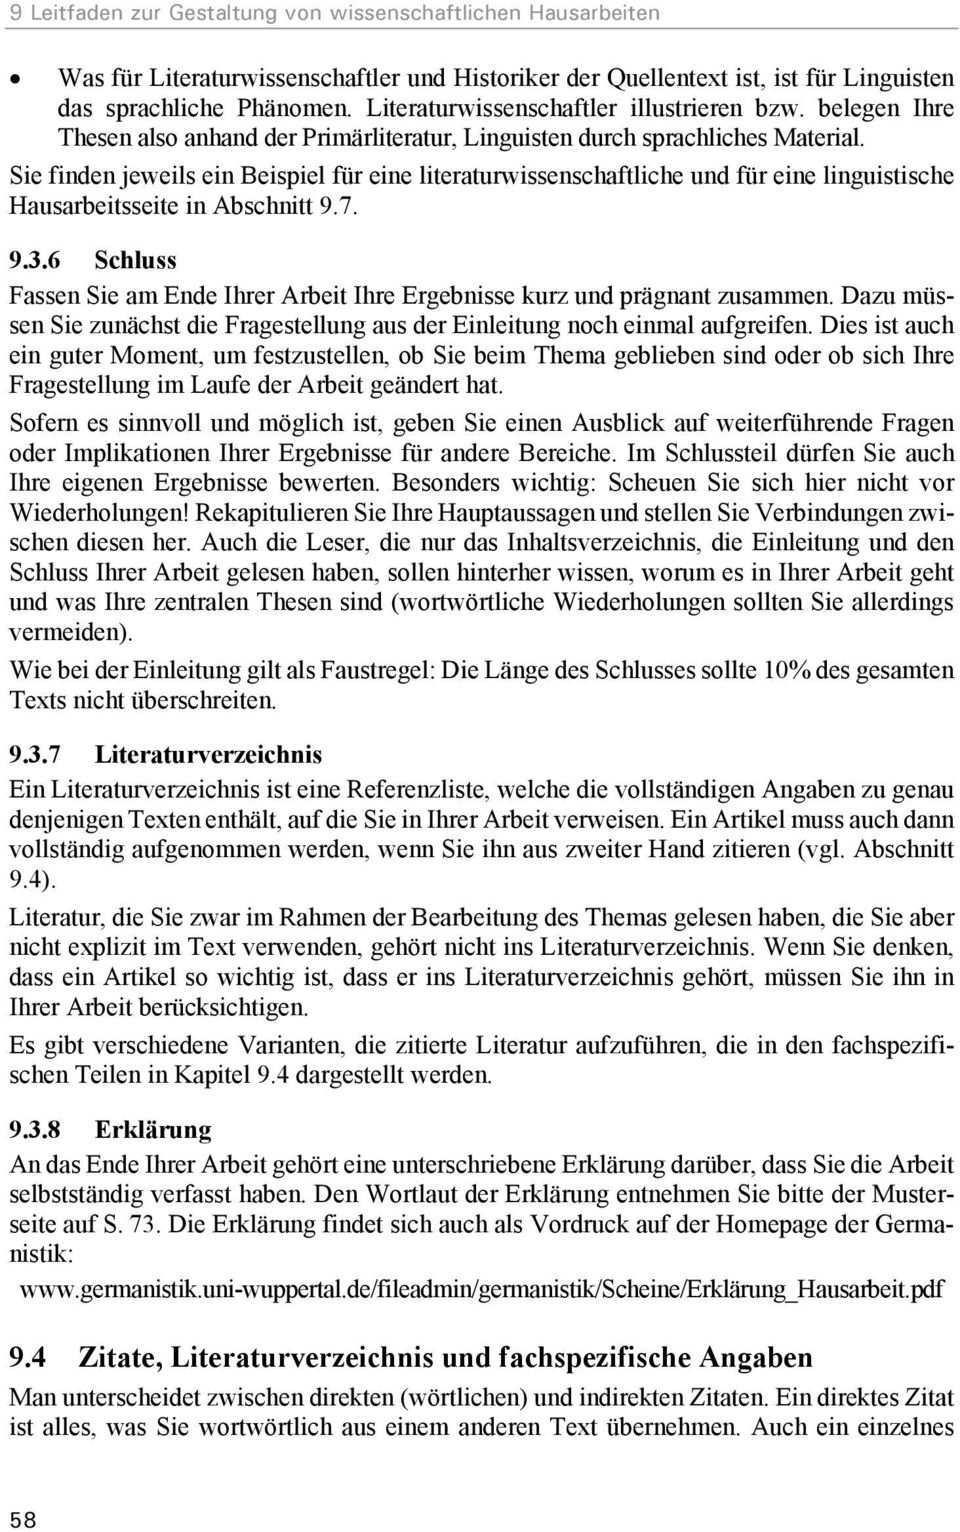 Germanistik In Wuppertal Pdf Free Download